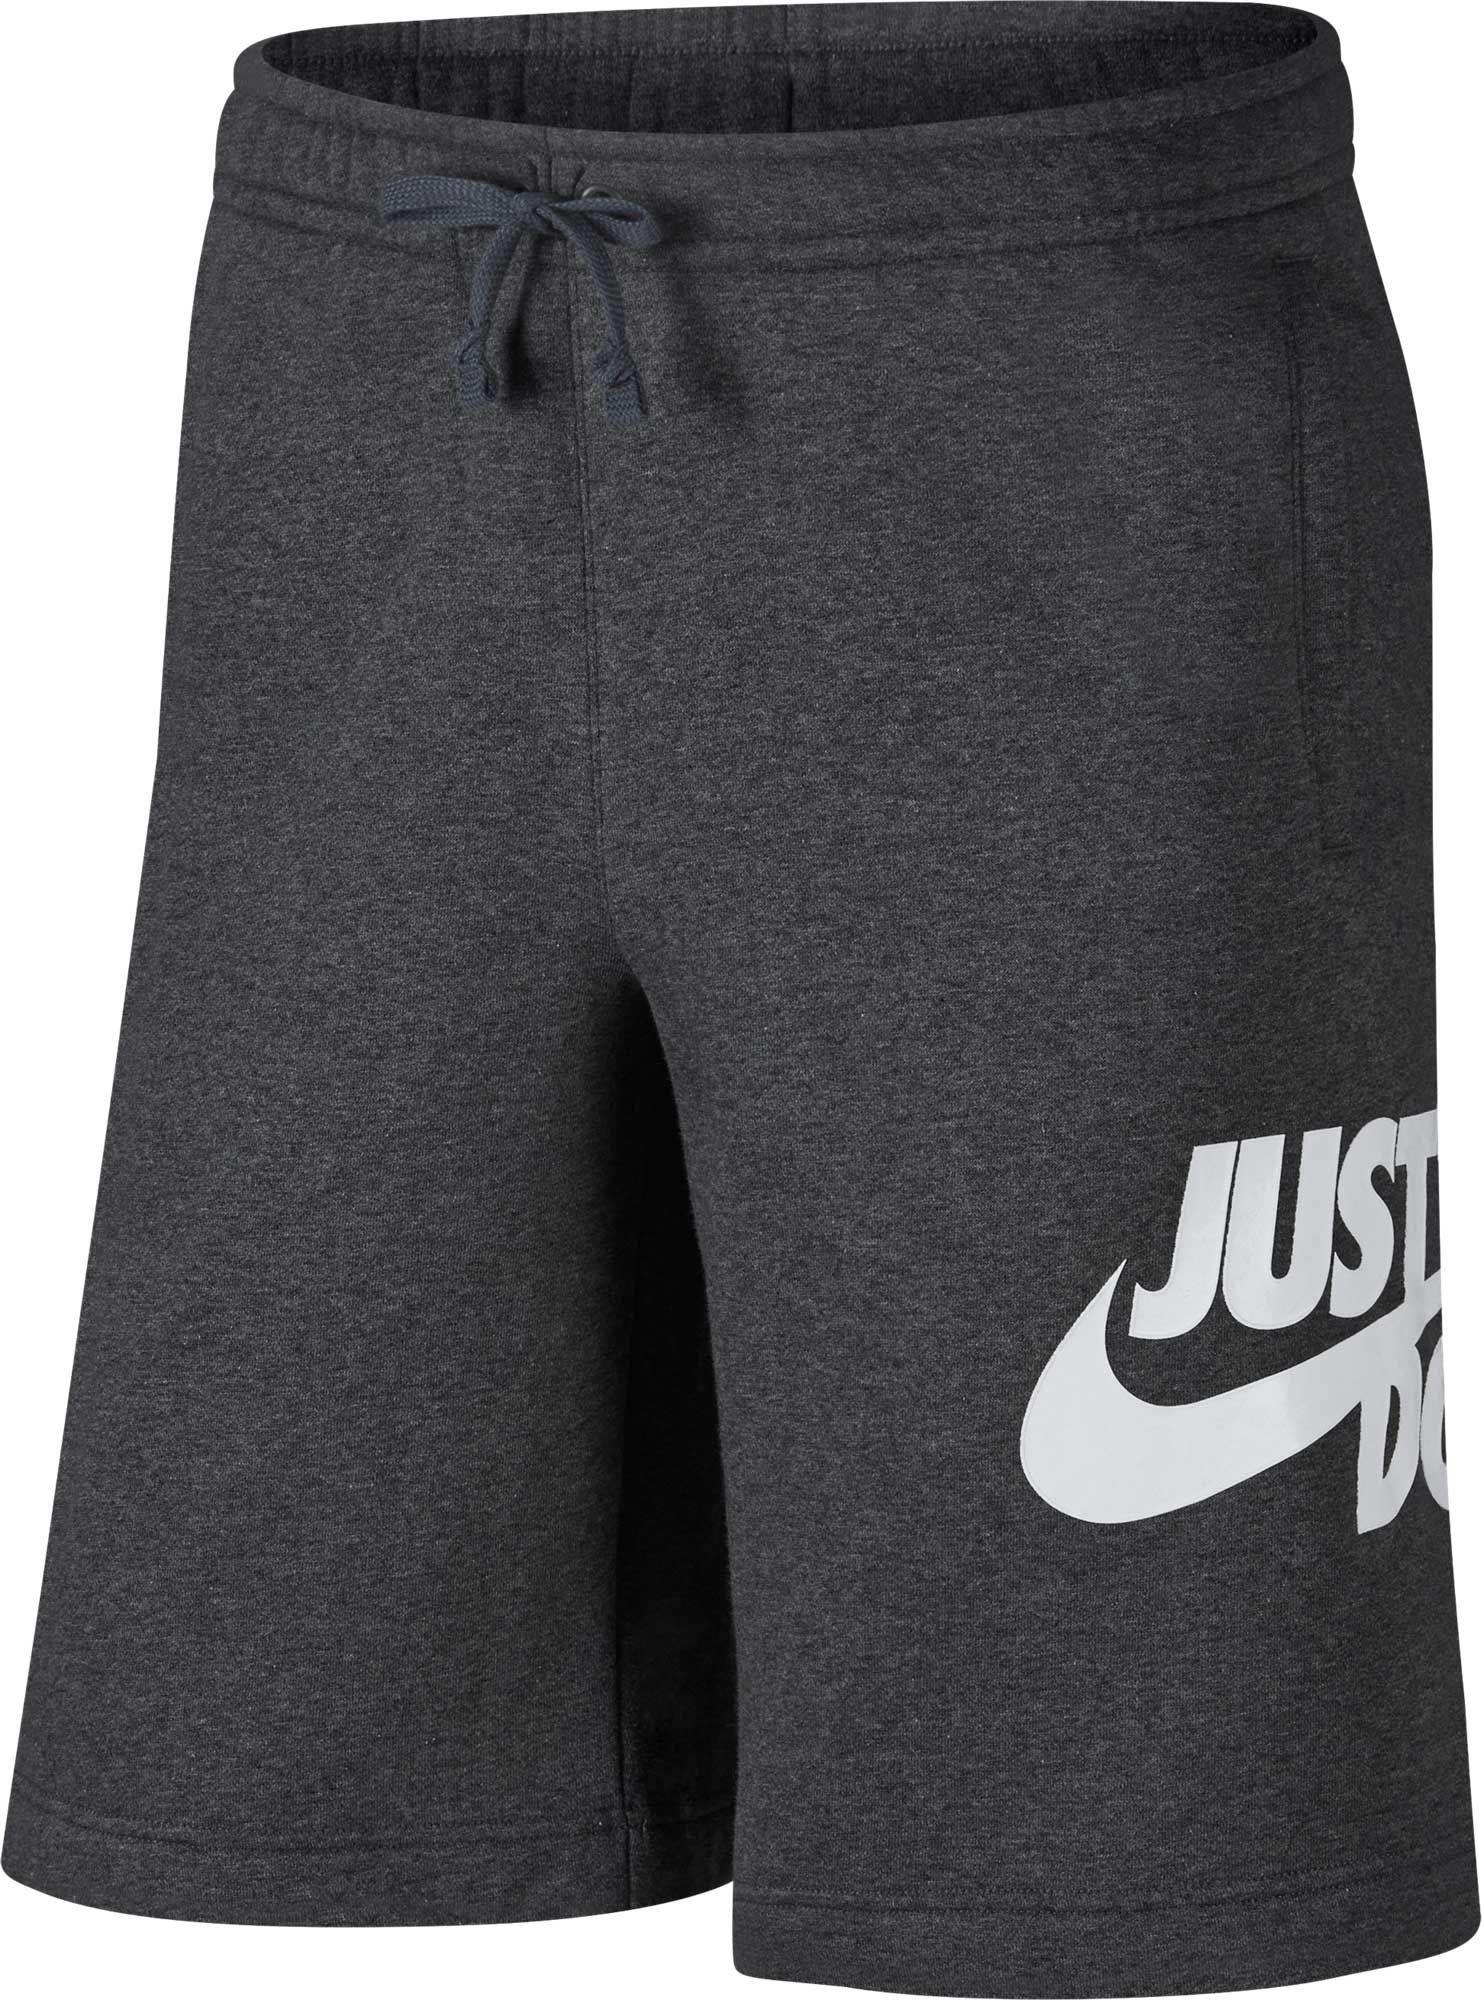 4702b68d0bf Nike Men's Sportswear Just Do It Training Shorts | Products | Nike ...